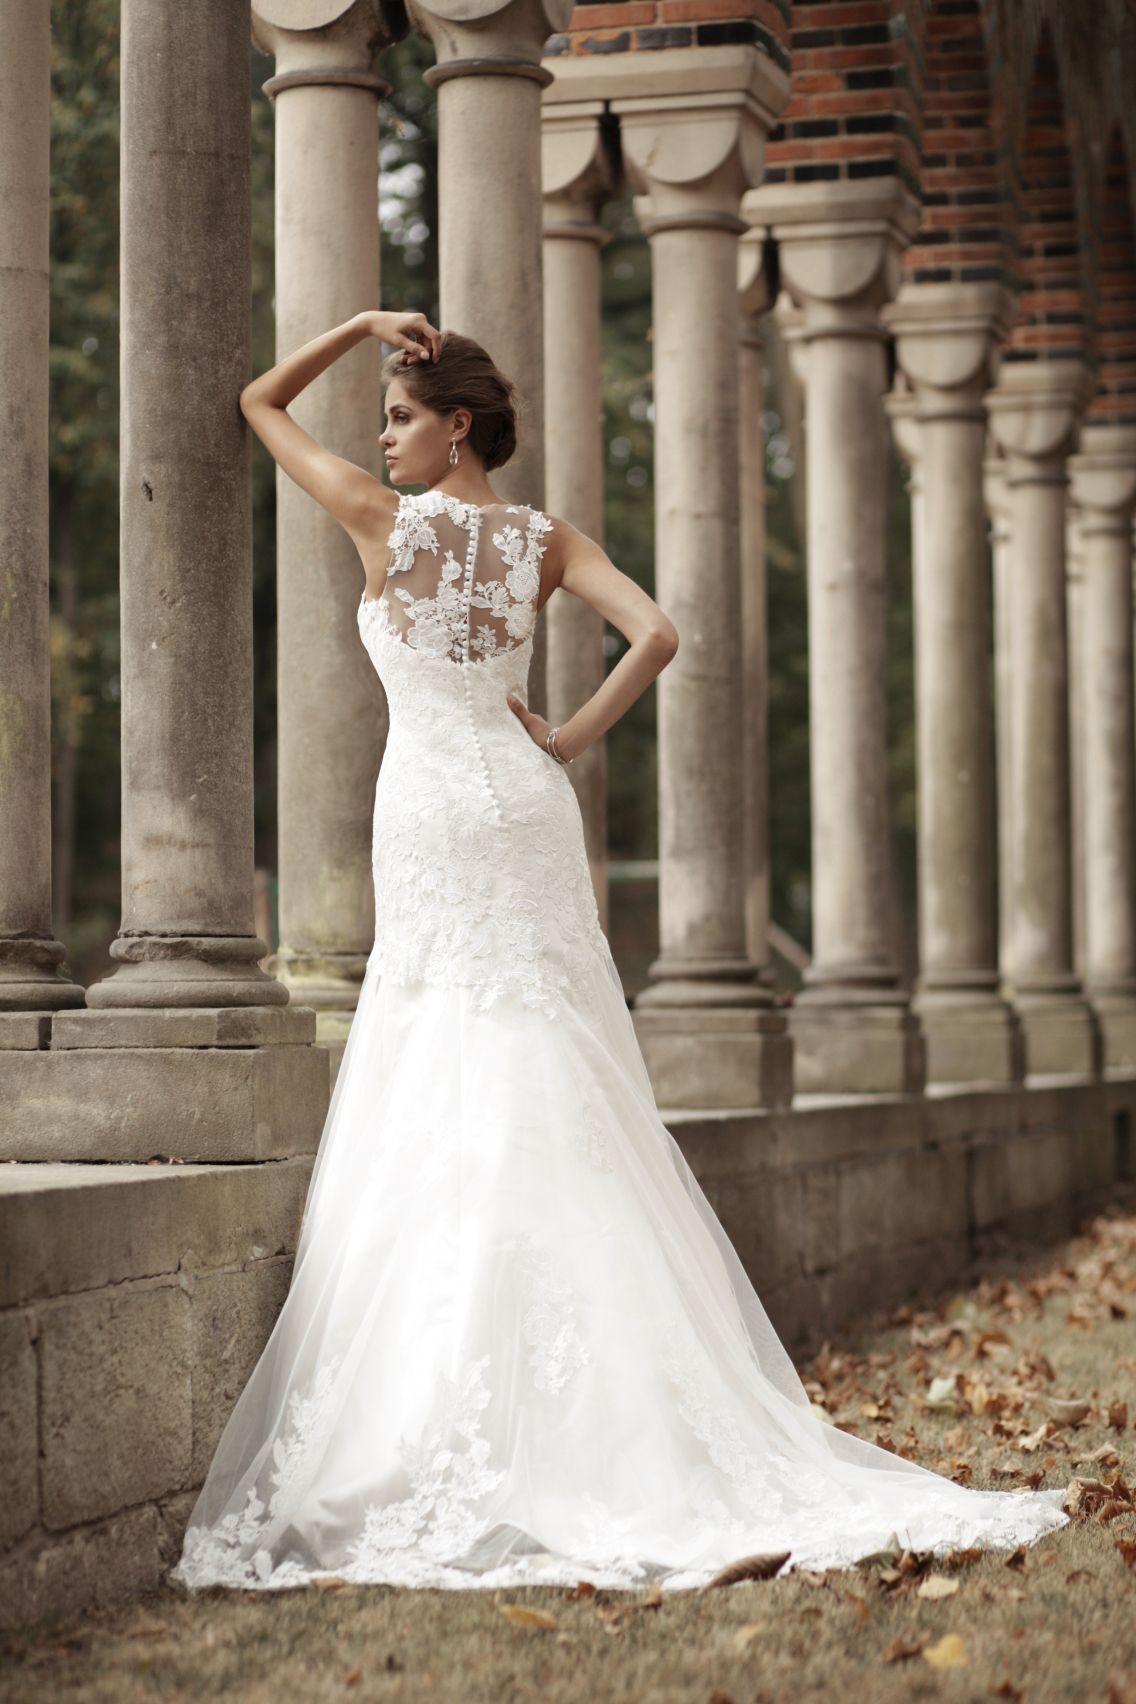 Zelda wedding dress  Pin by M Obrostek on Wedding dress  Pinterest  Wedding dress and